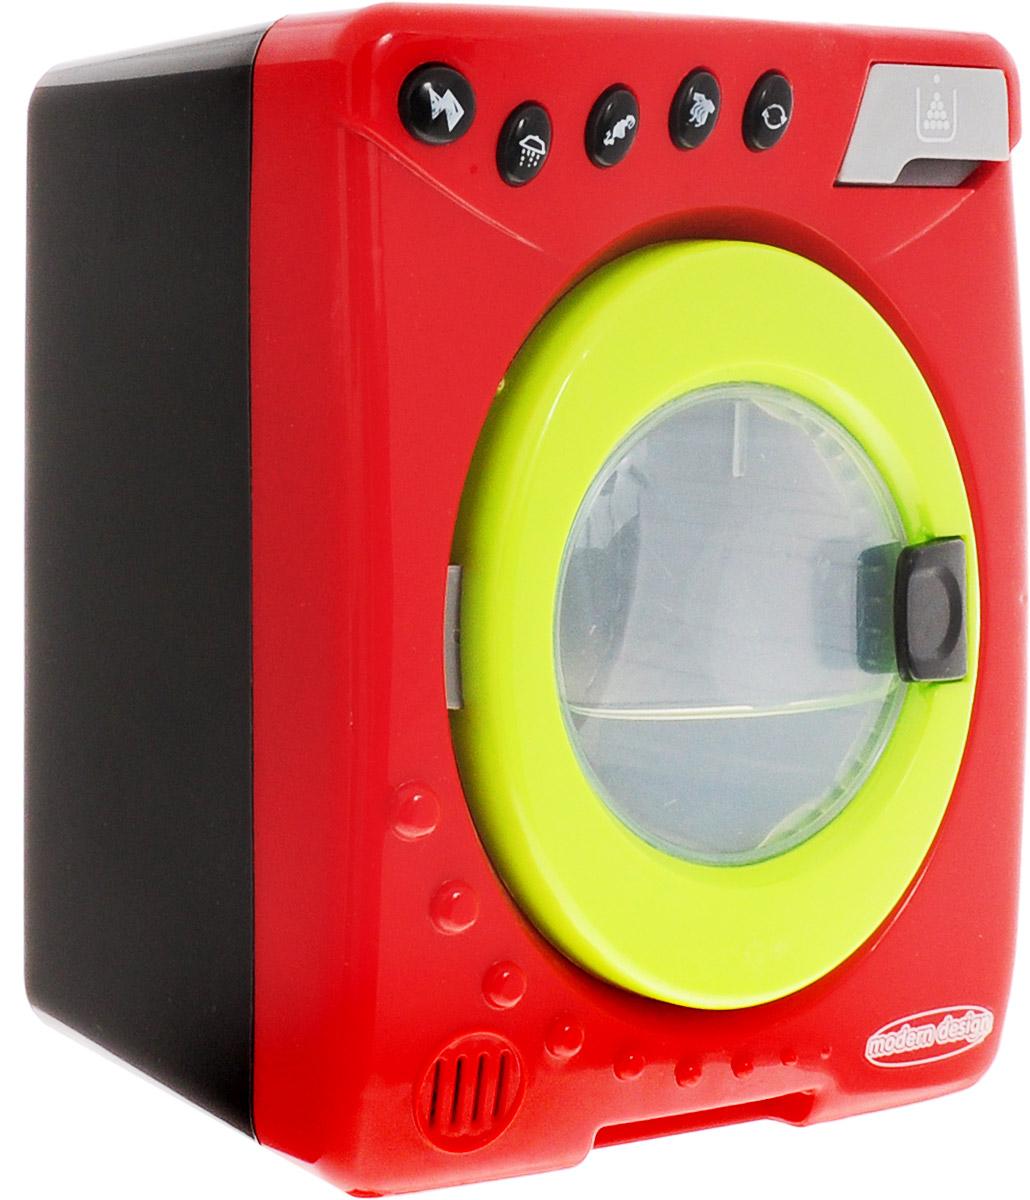 Veld-Co Игрушечная стиральная машина 47907 компактная стиральная машина купить киев